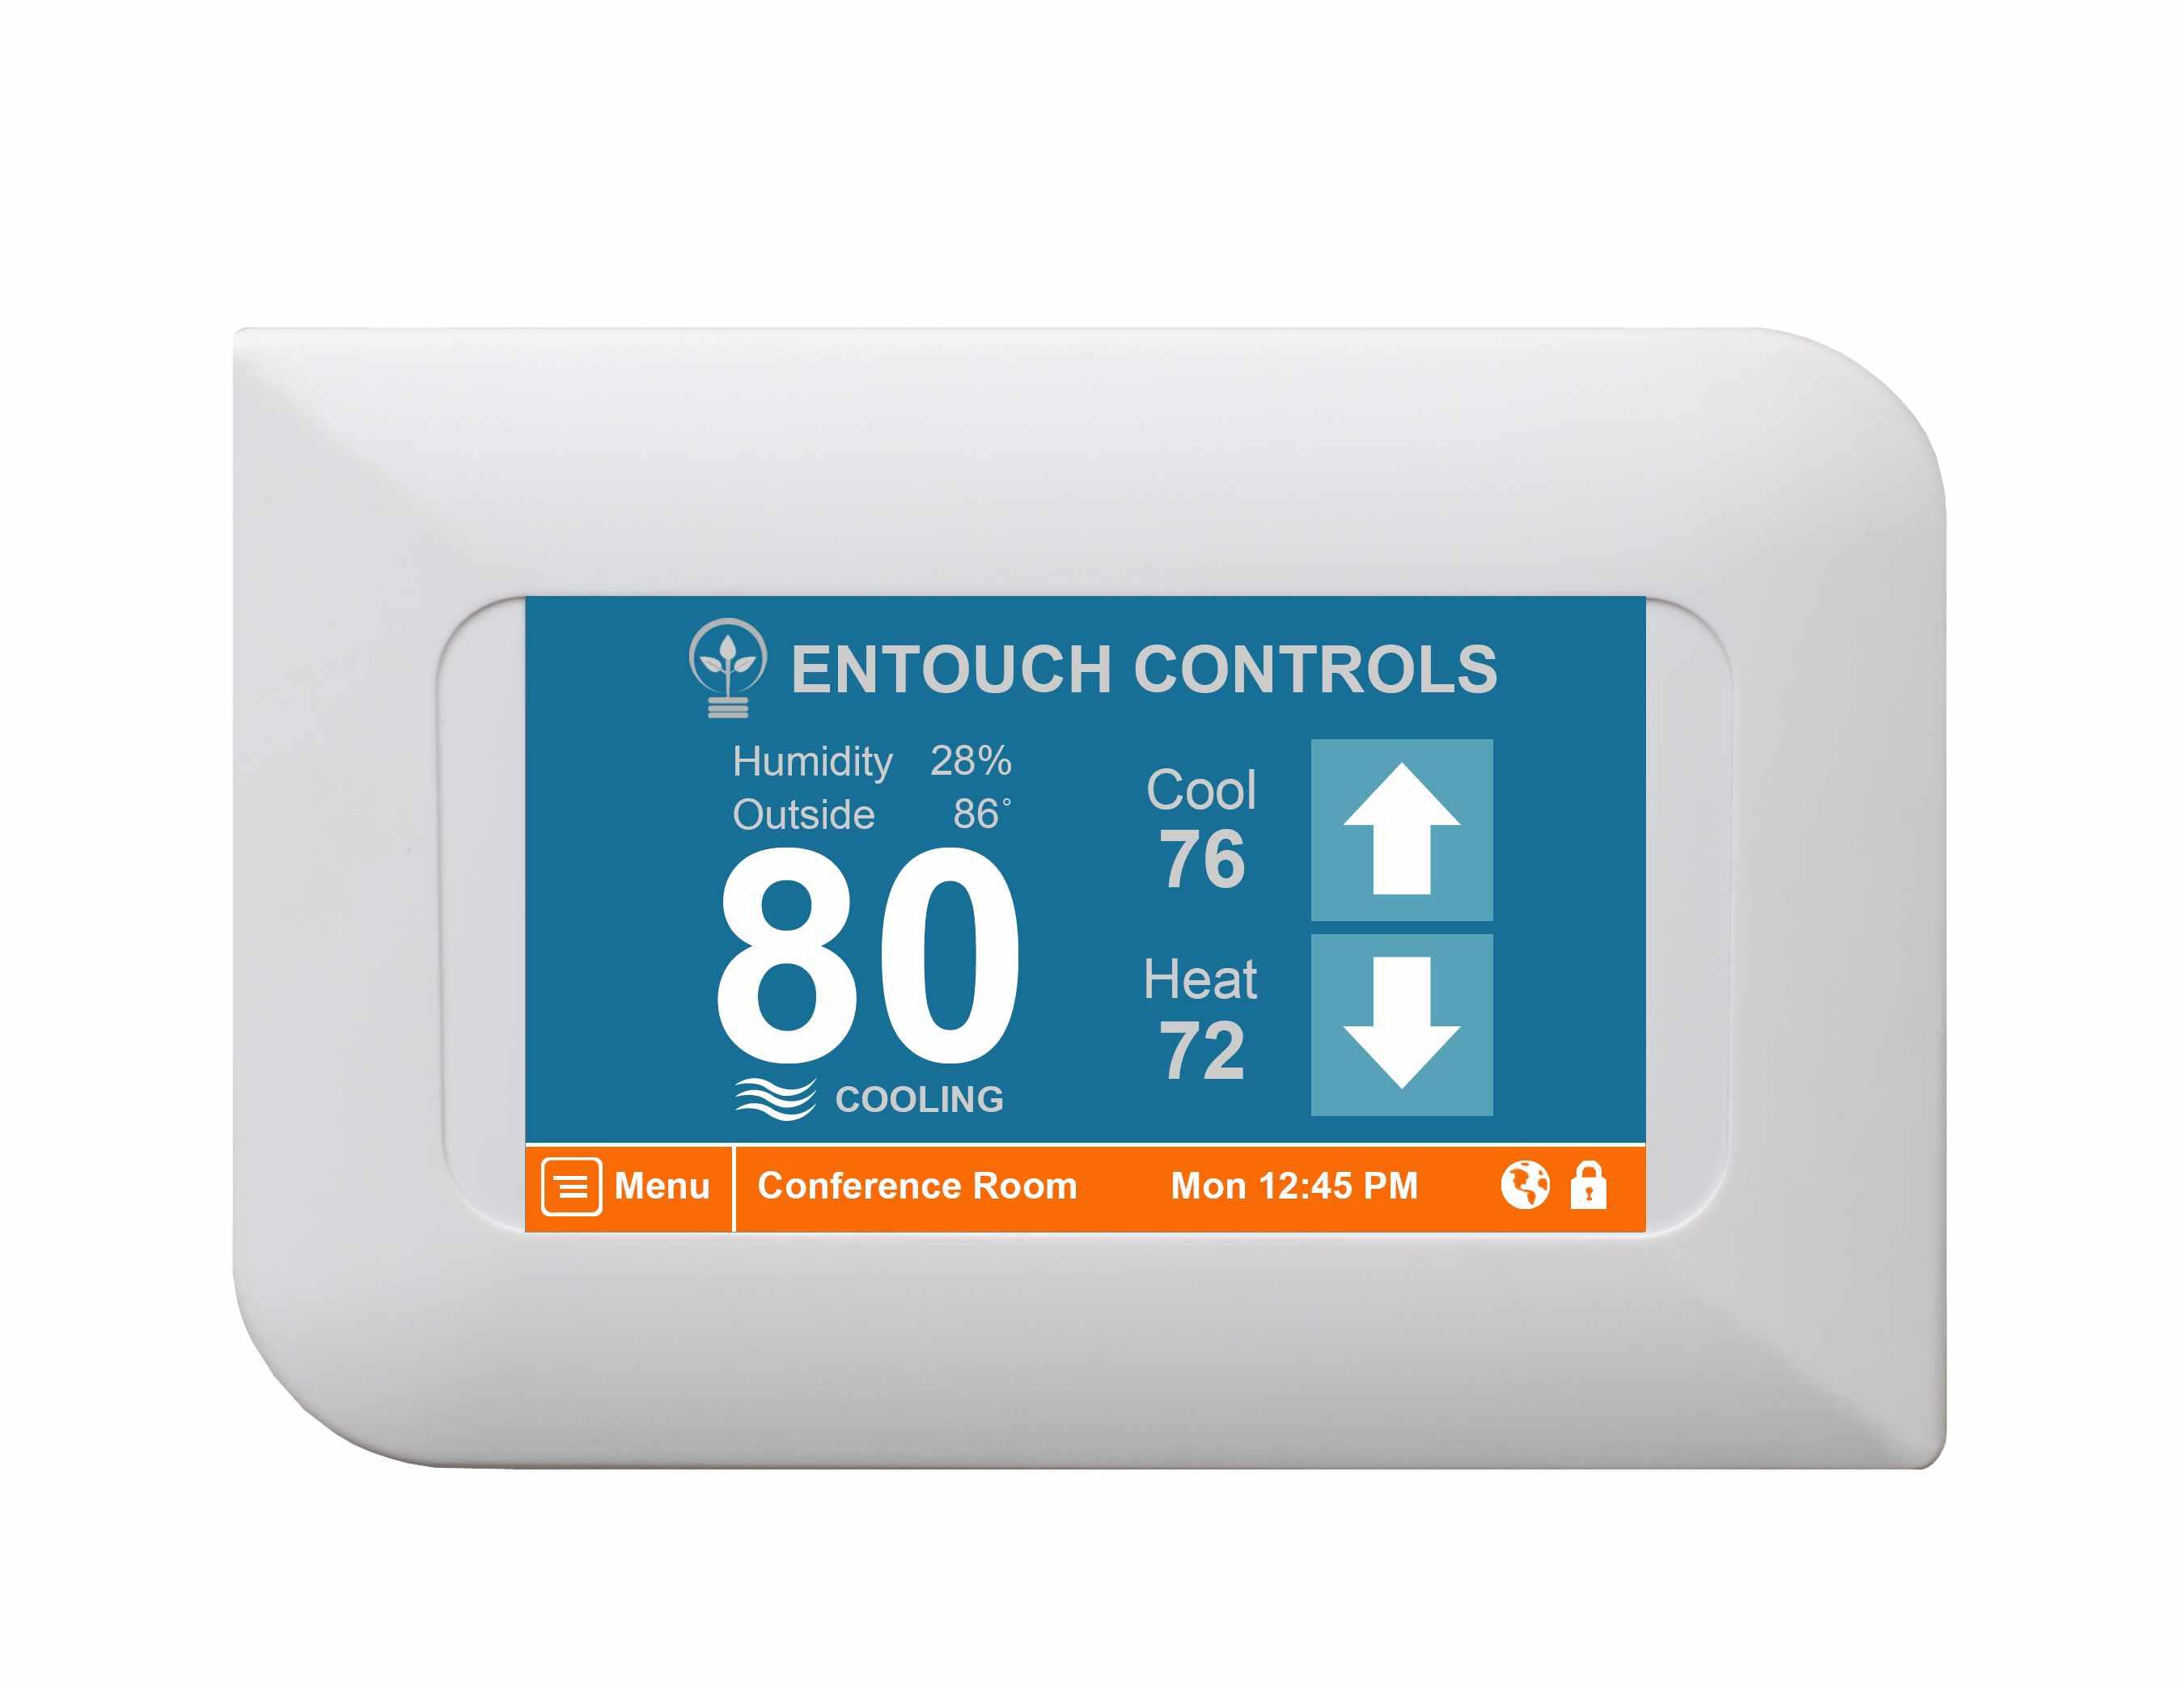 EnTouch Leverages Partnership With Telit To Enhance Energy ...